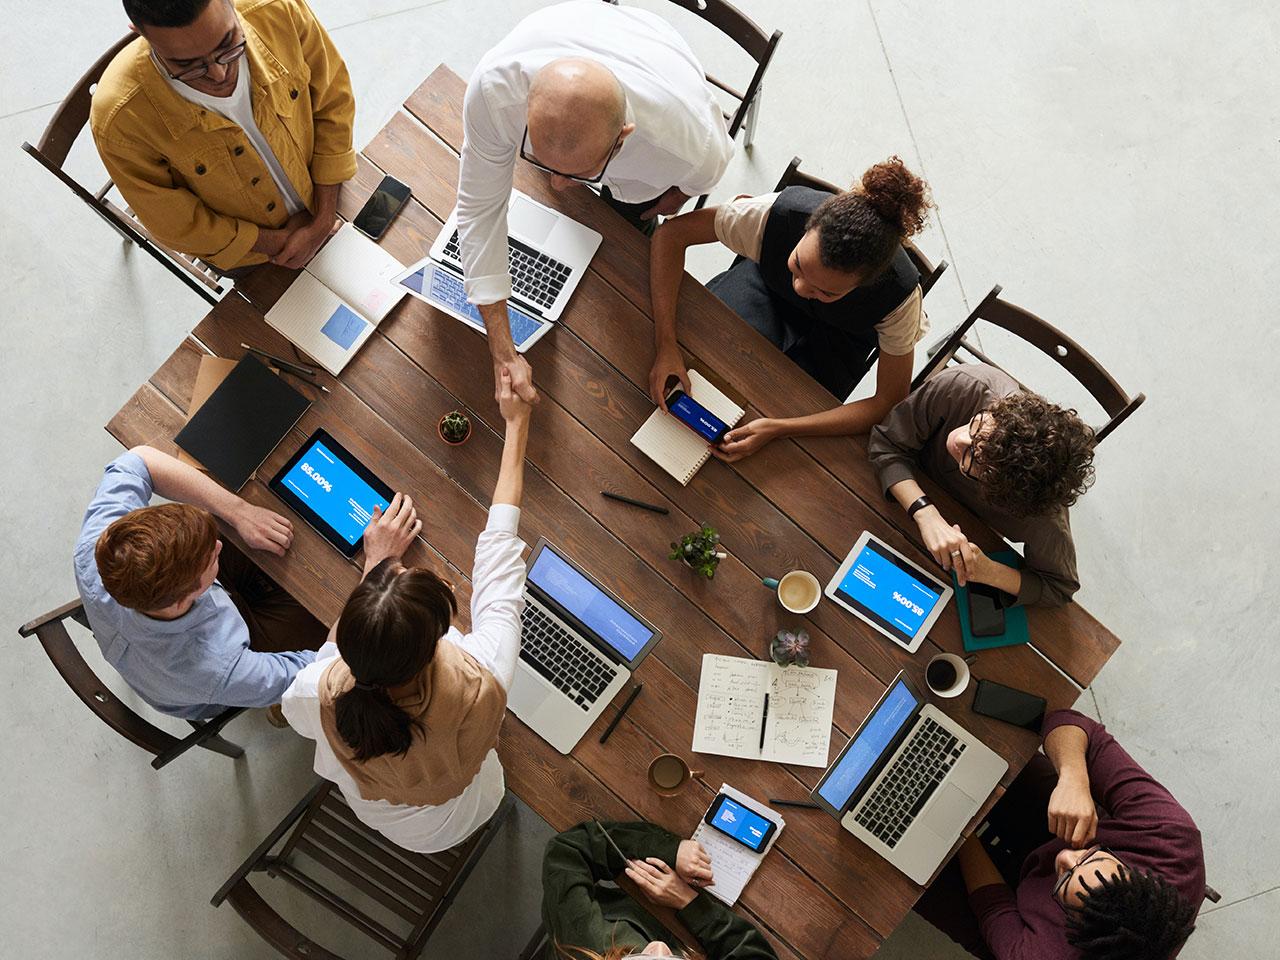 teamwork-brainstorming-concept